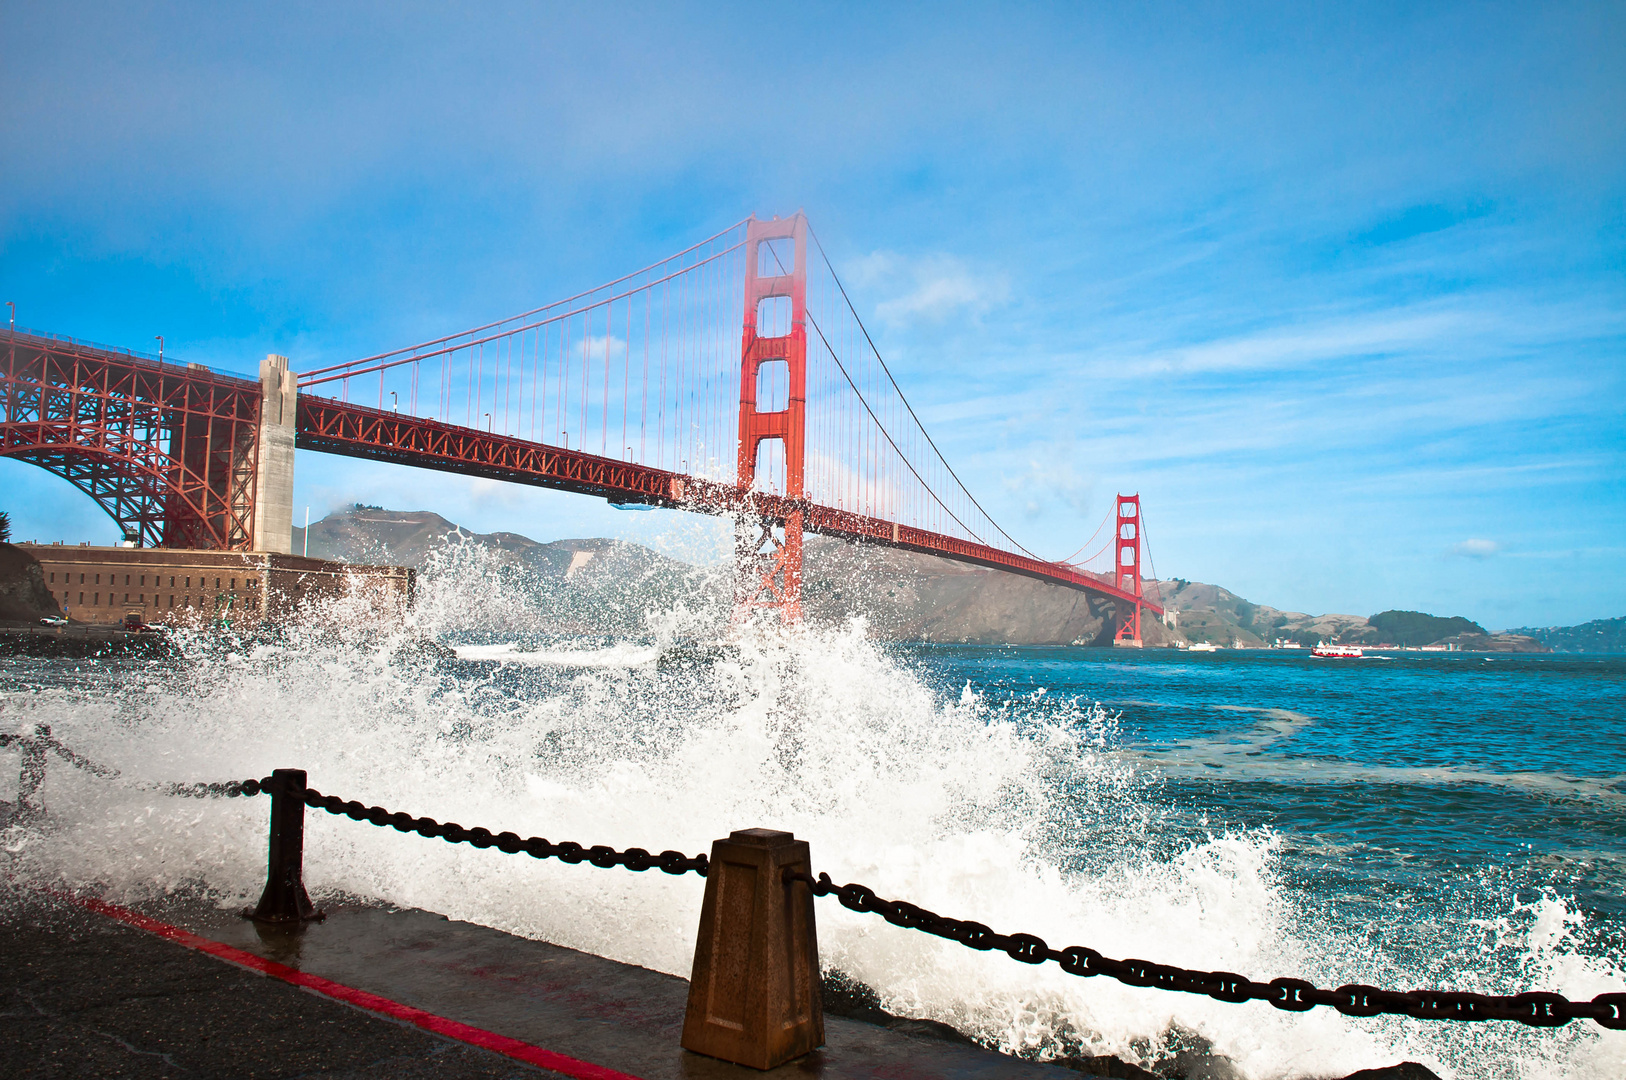 Golden Gate Bridge's wave